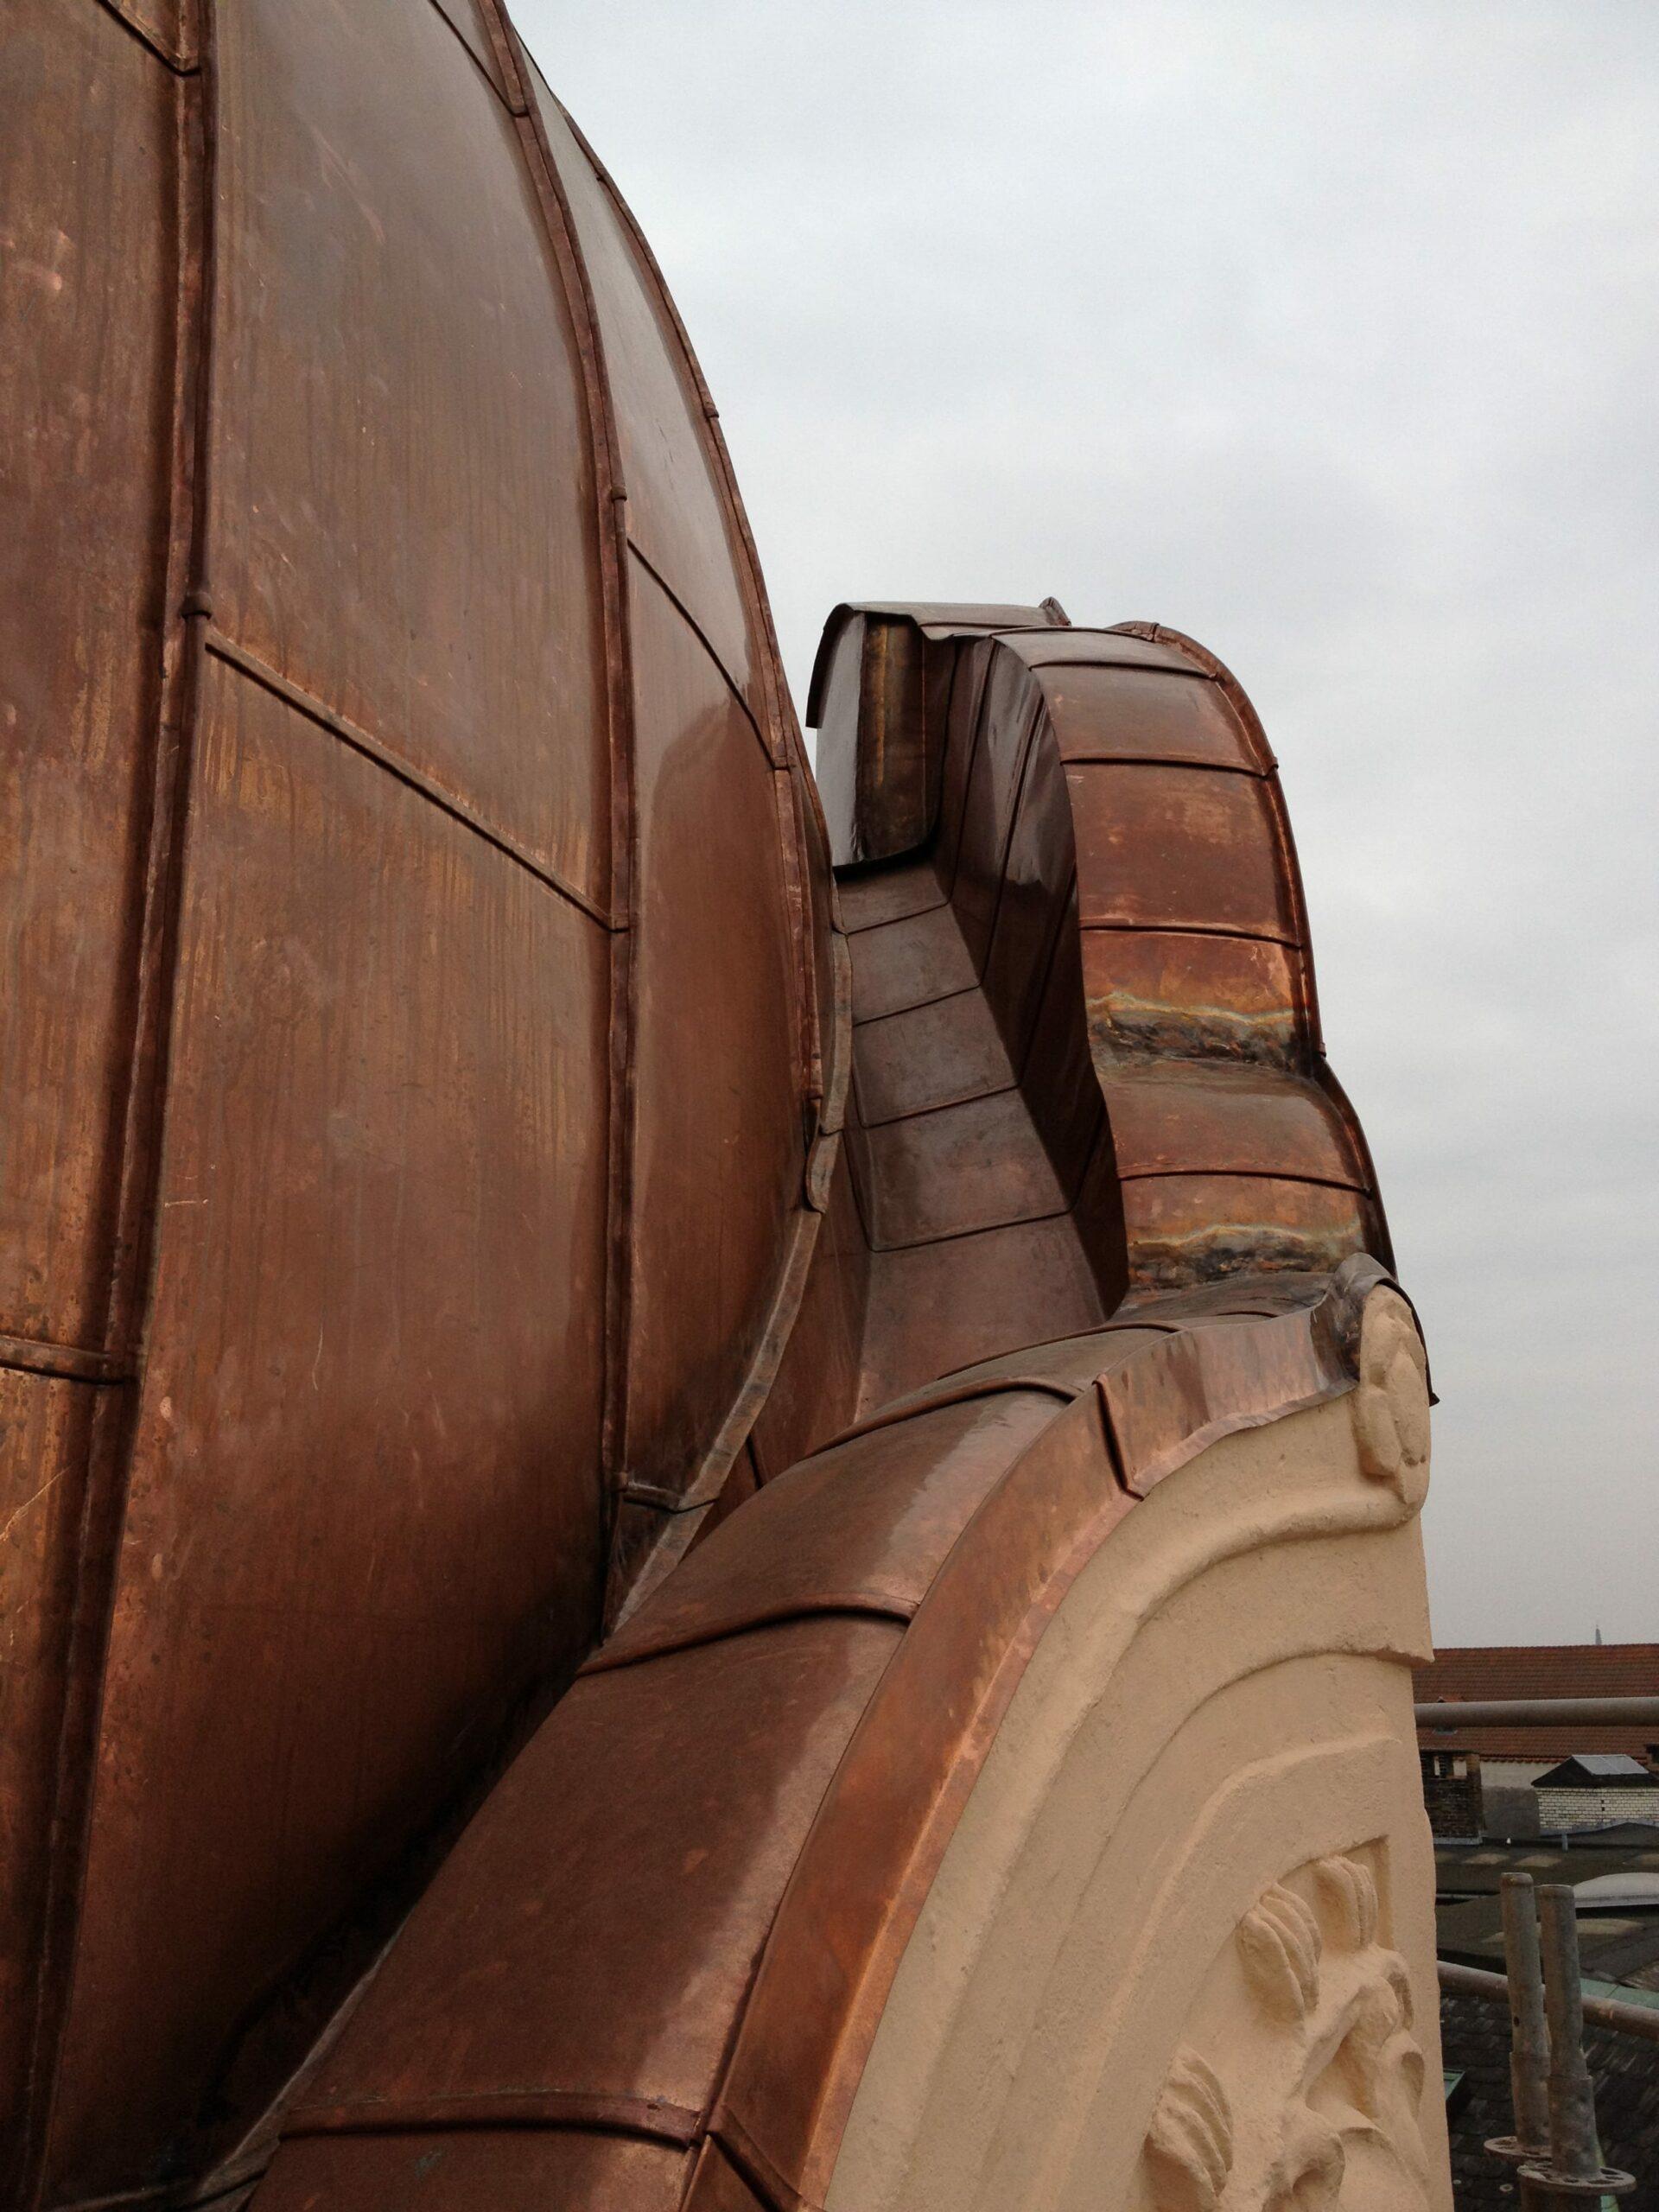 Copper scooter - Metropol